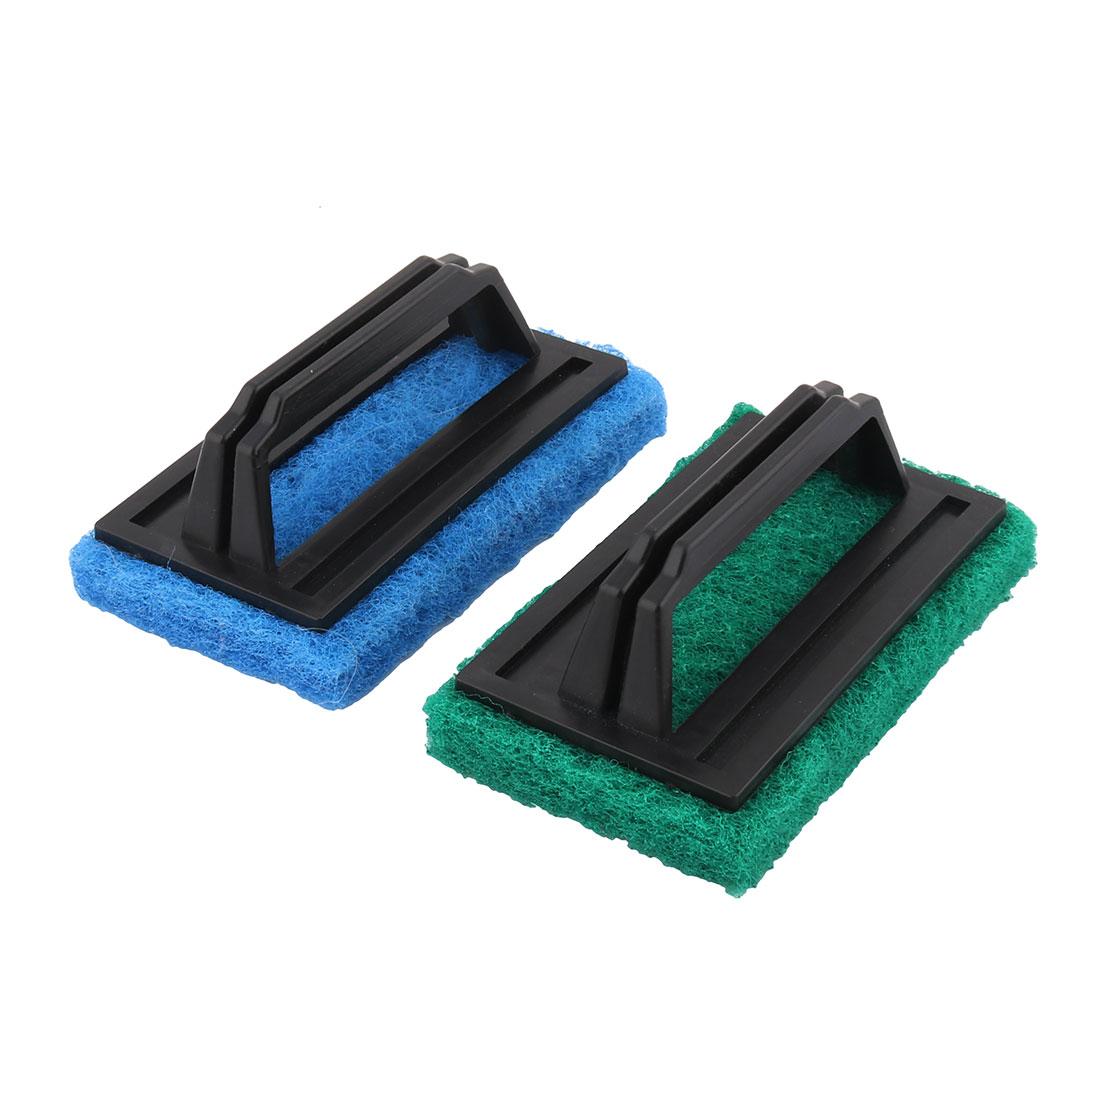 Household Kitchen Bathtub Plastic Handle Sponge Pad Washing Cleaning Brush Tool 2pcs